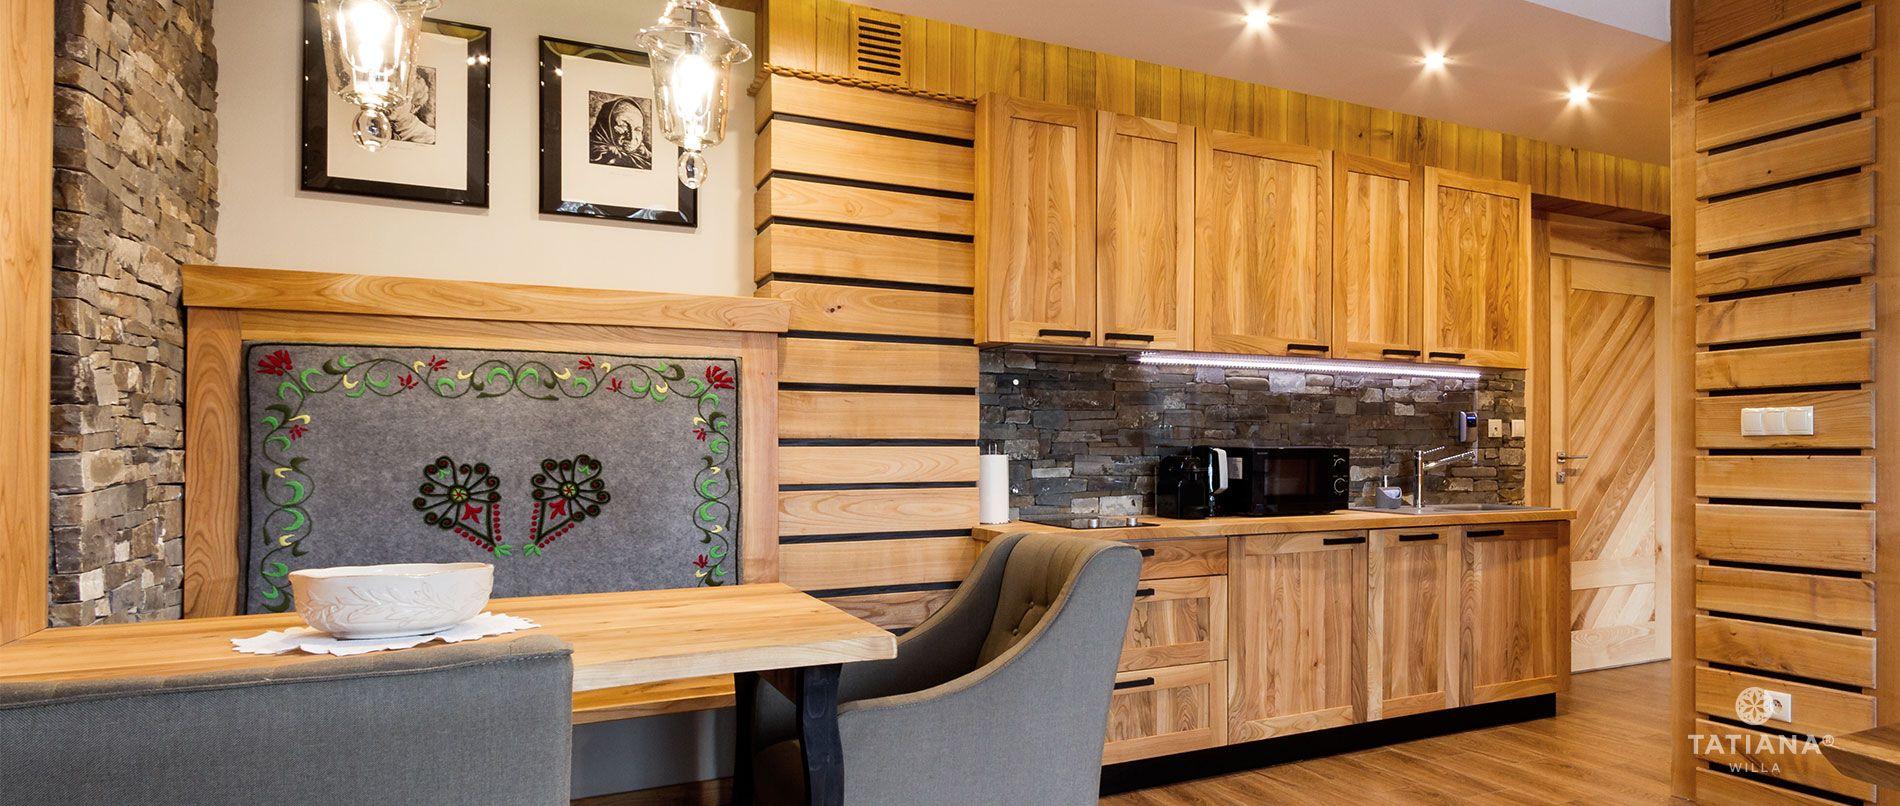 Cherry Apartment - kitchenette